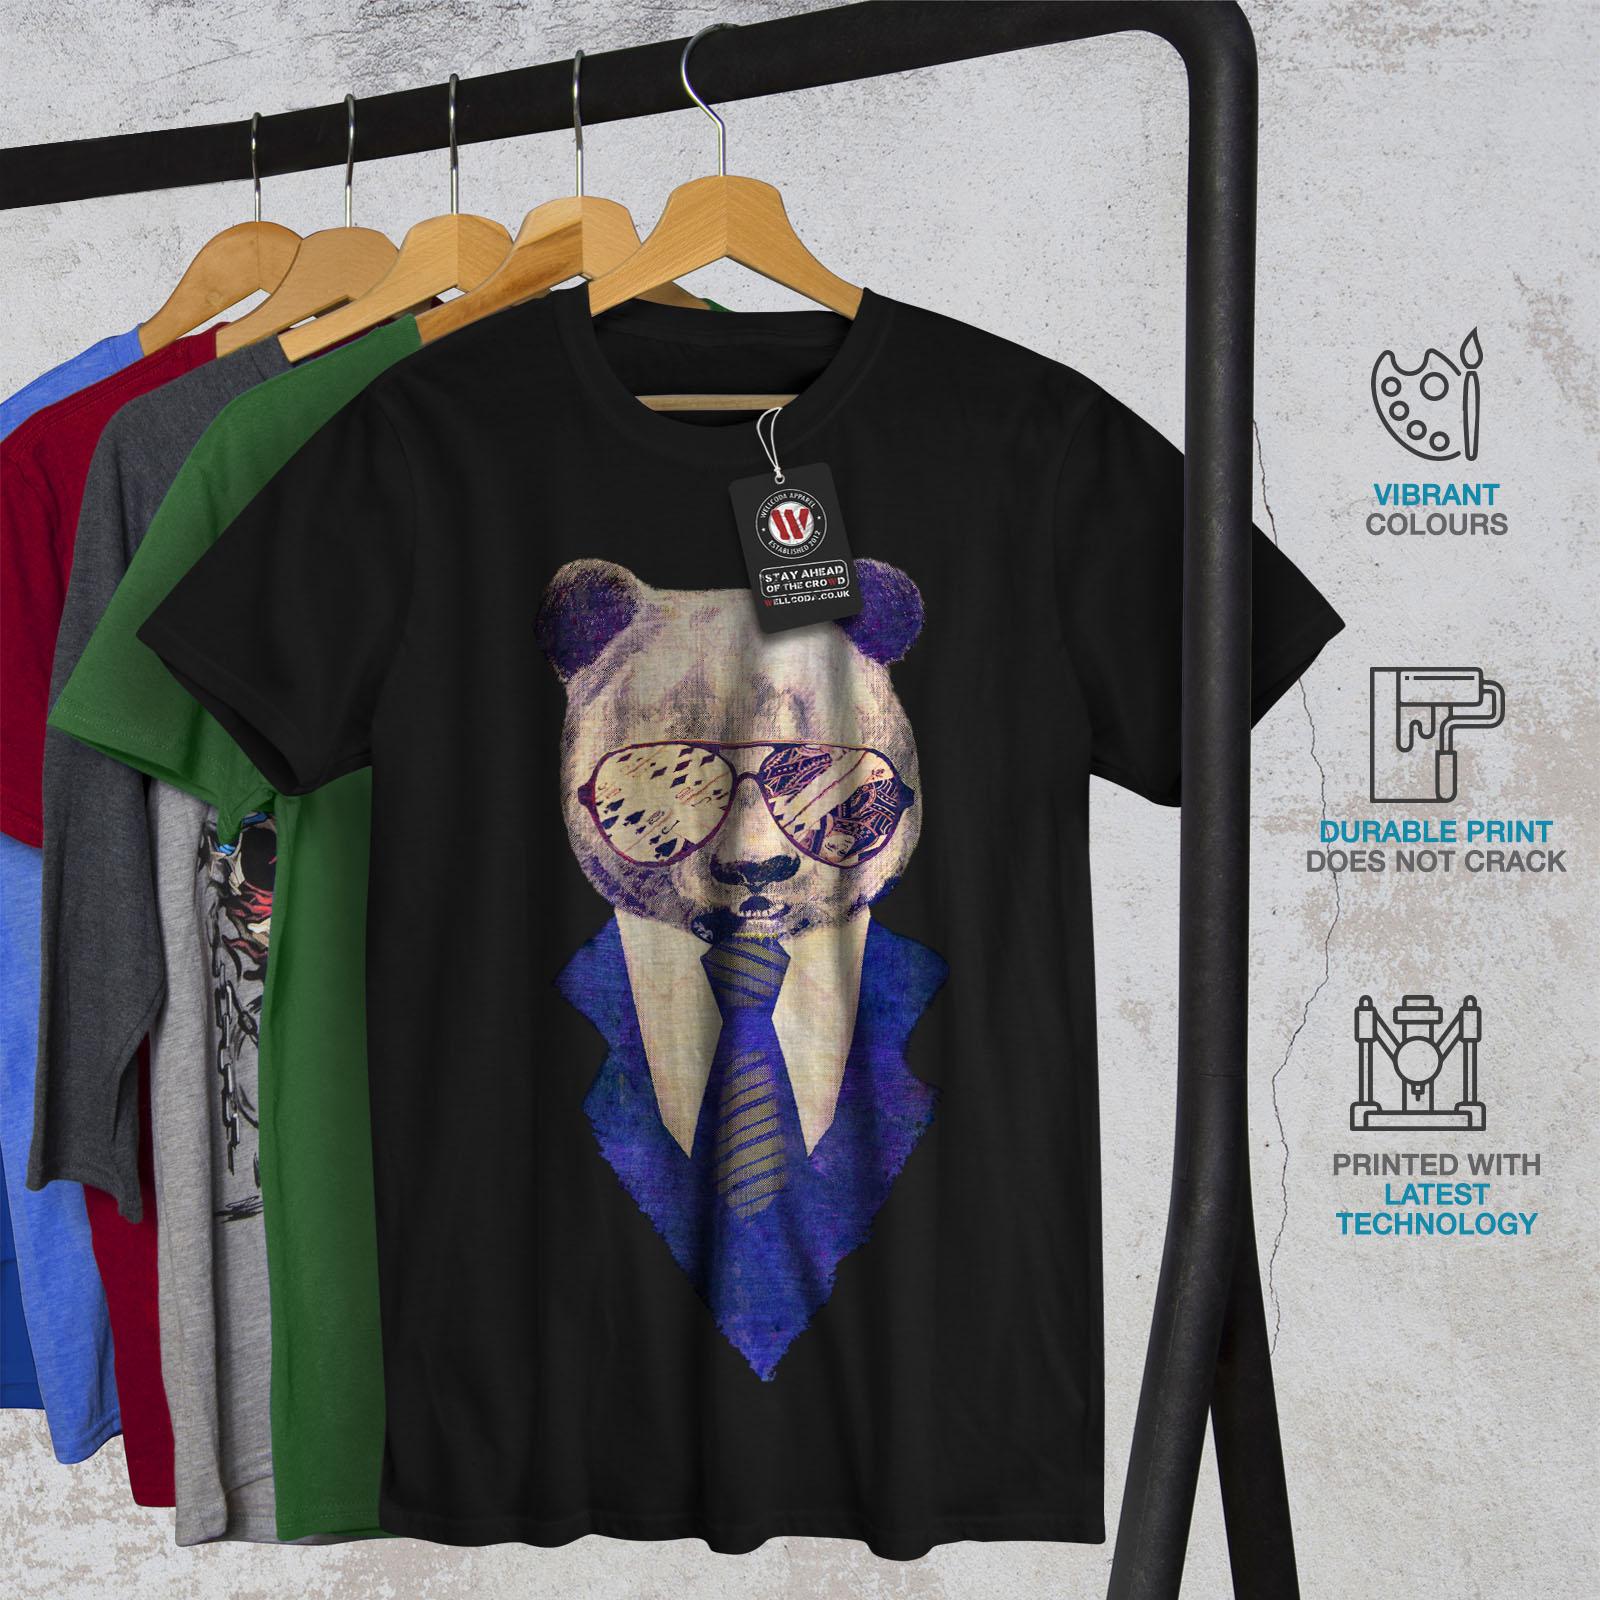 Wellcoda Music Fan Panda Bear Mens T-shirt Funky Graphic Design Printed Tee